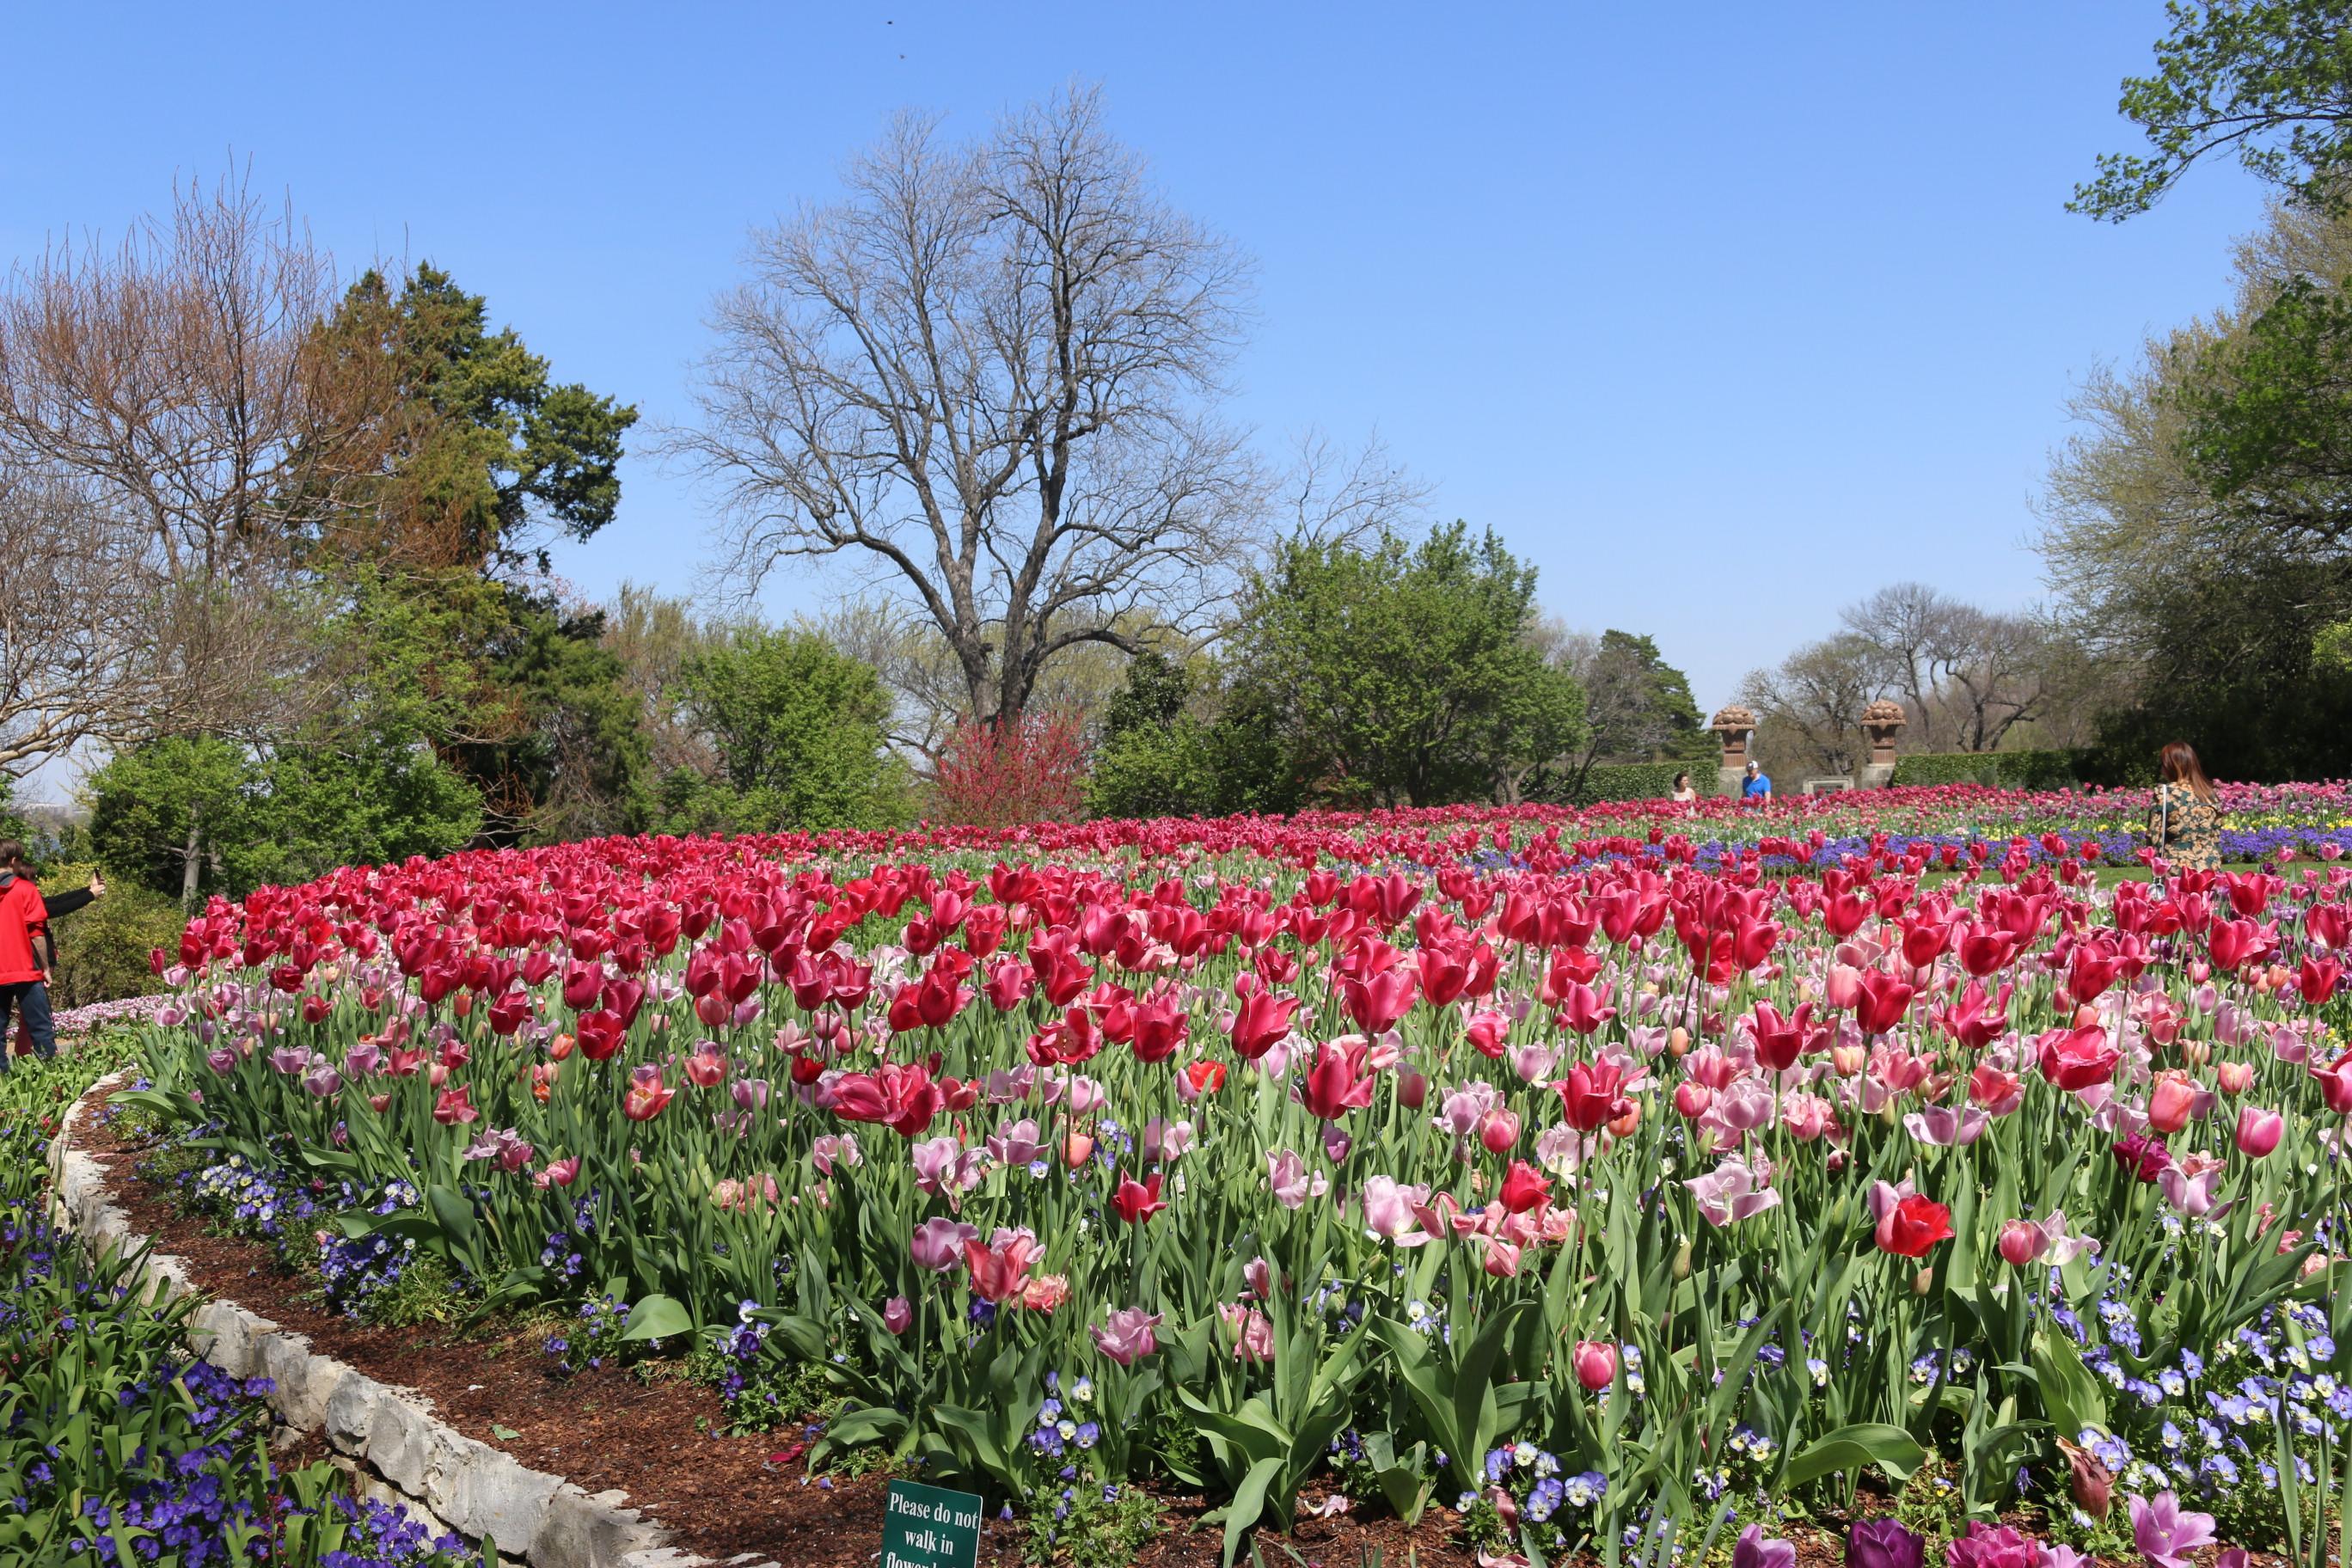 File:The Dallas Arboretum And Botanical Garden